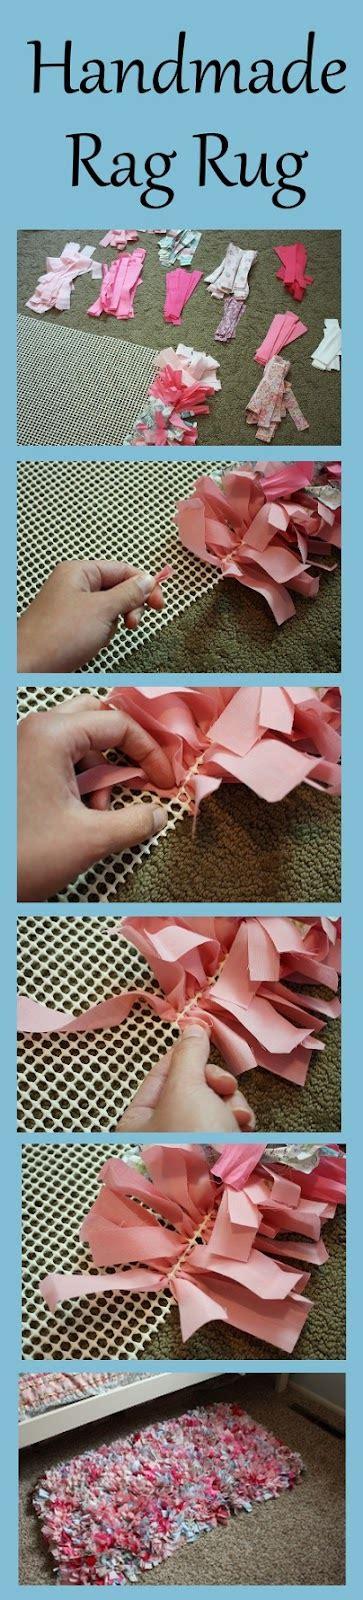 diy rag rug everyday diy handmade rag rug tutorial